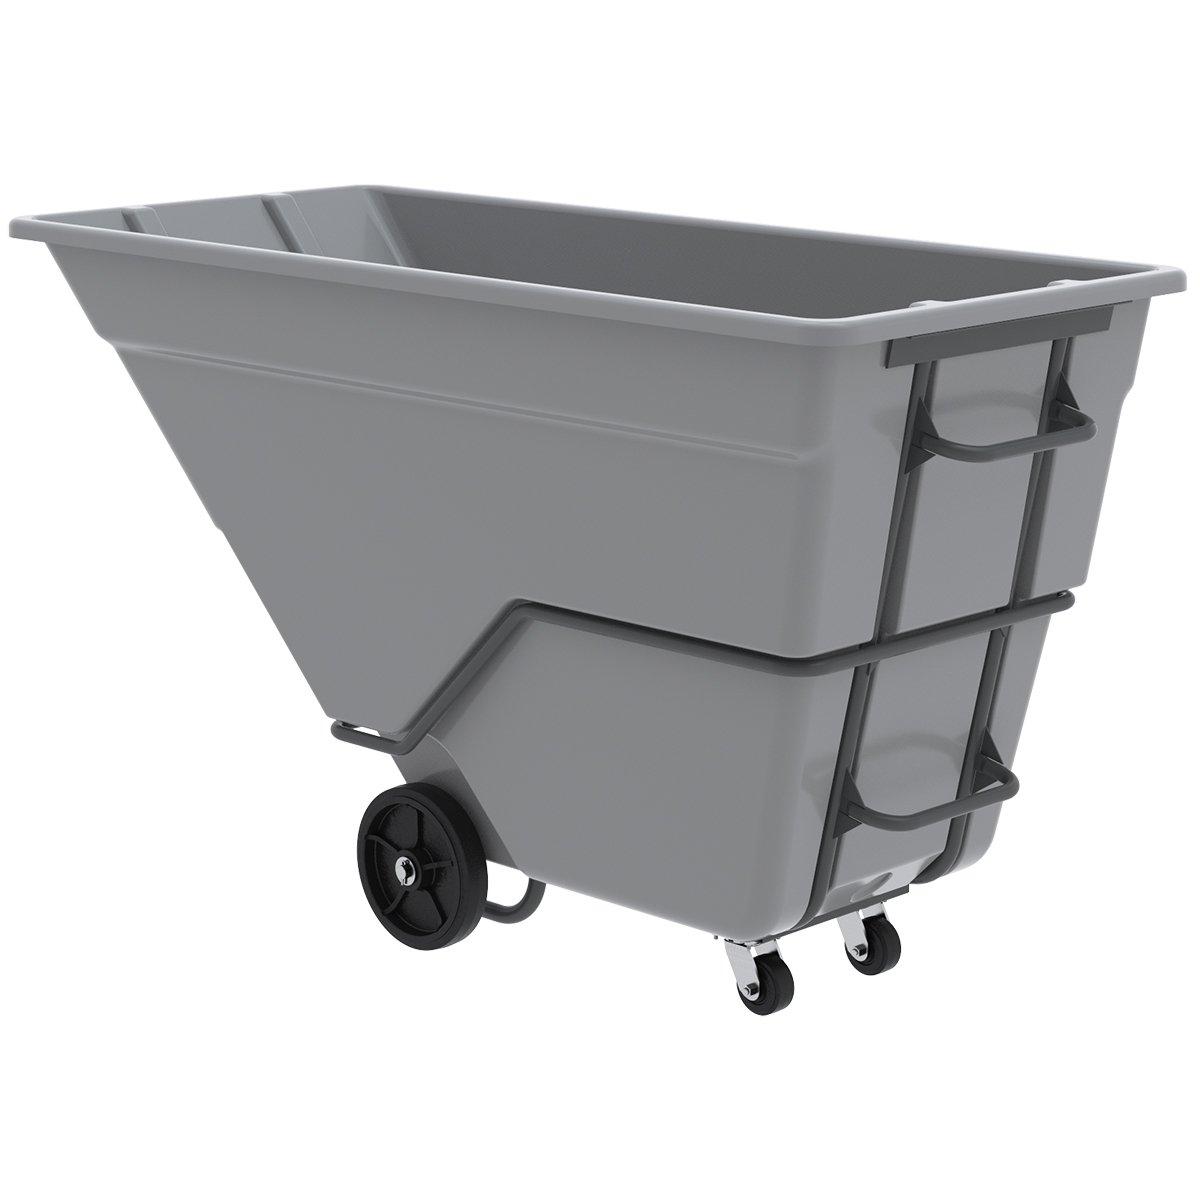 Akro-Mils 77710 300 Gallon, 1.5 Cubic Yard, 2000 lb. Capacity Heavy Duty Plastic Tilt Truck, Grey, 39-Inch W BY 84-Inch L by 51-Inch H